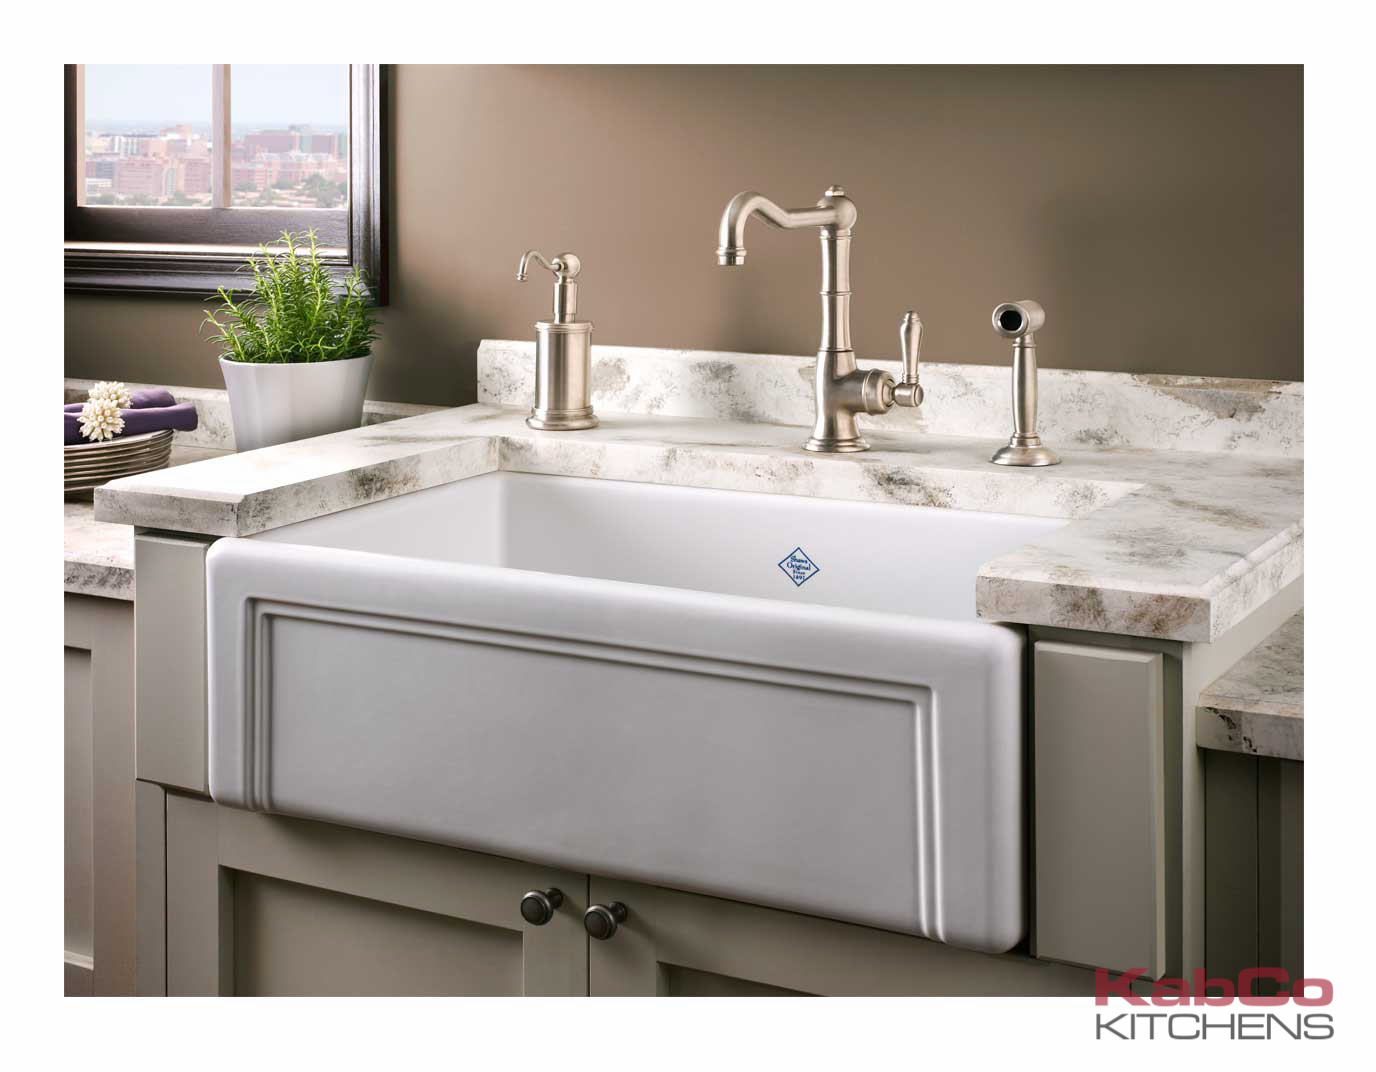 Kitchen Sinks Miami Pembroke Pines And Miramar